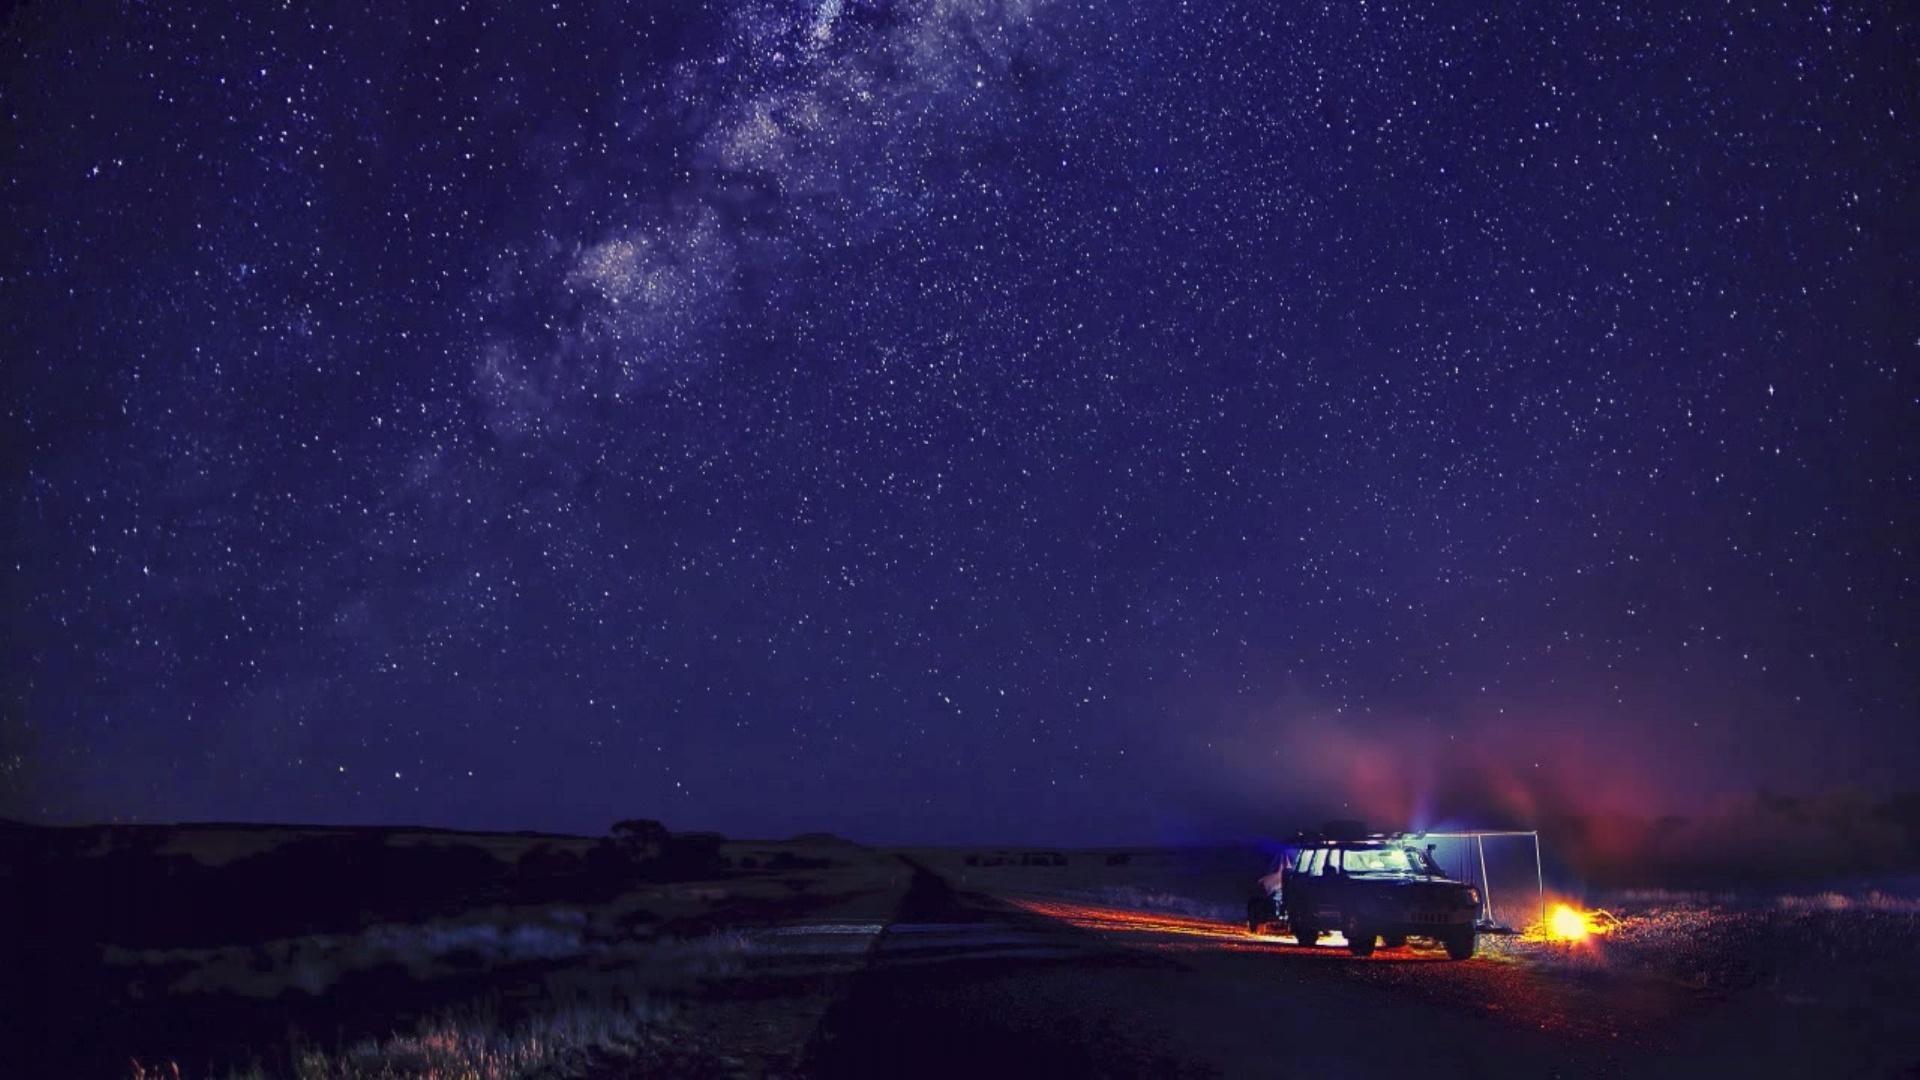 Звездное небо   картинки на рабочий стол телефона (12)